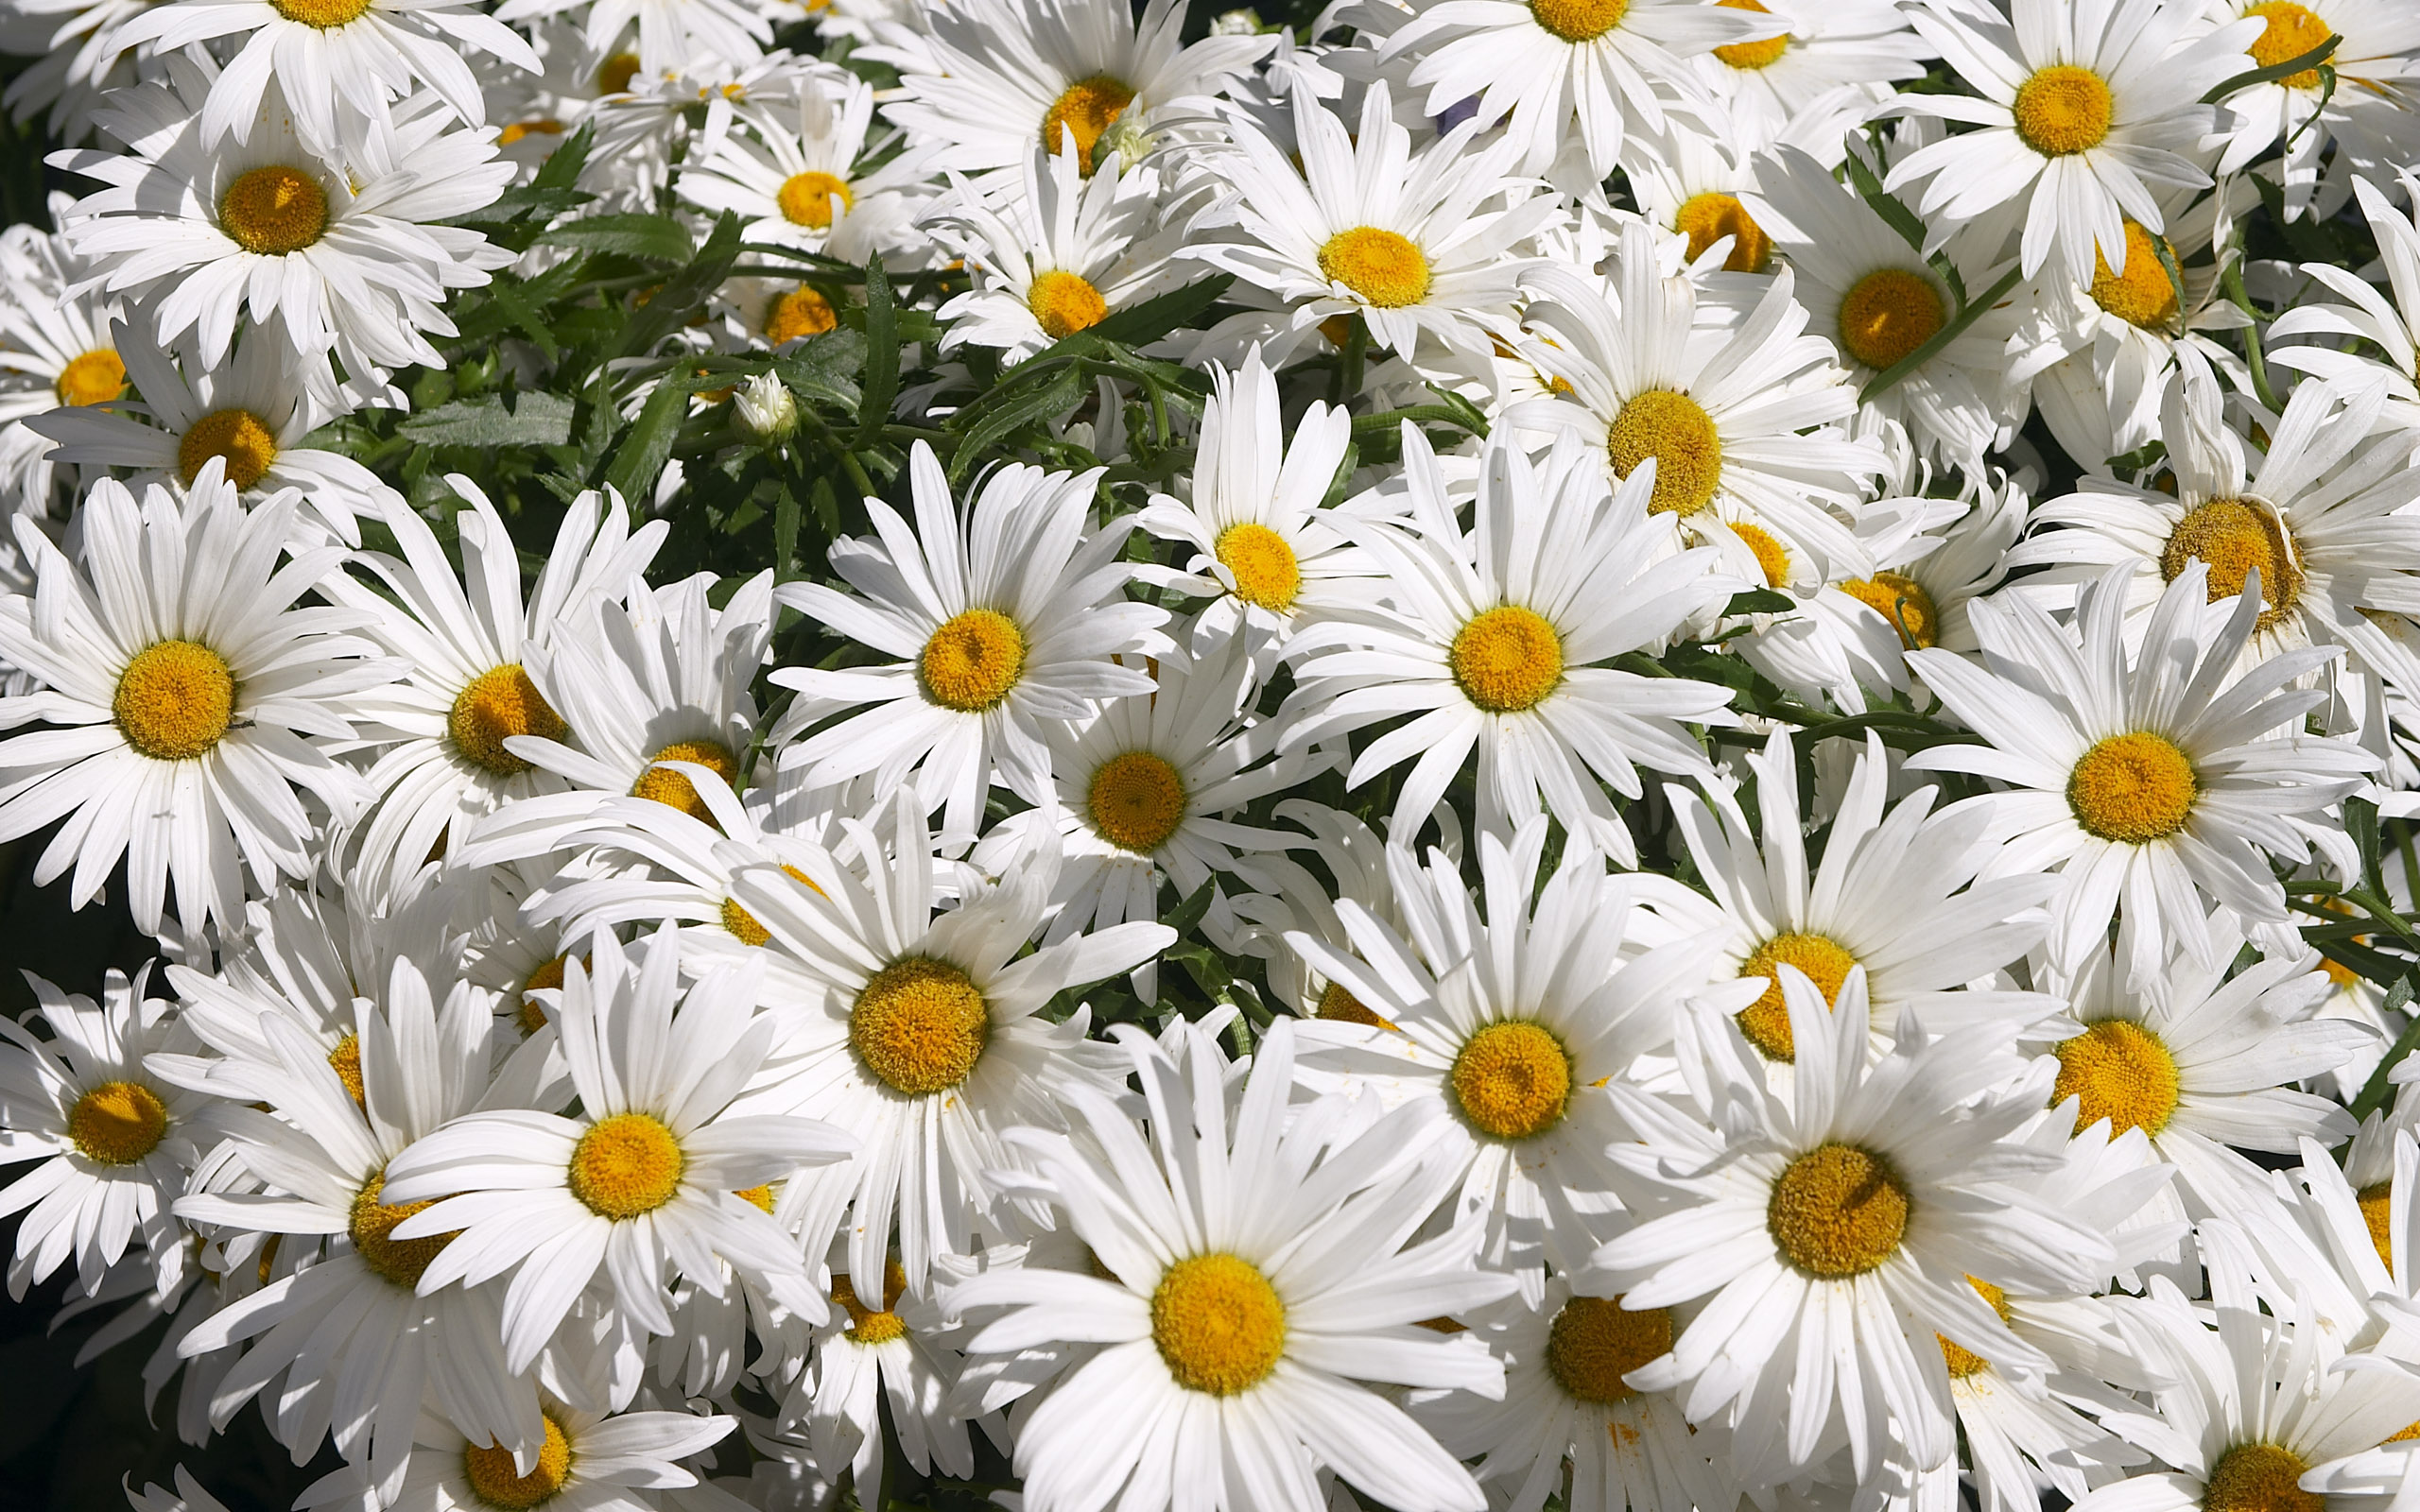 Цветы ромашки фото и картинки